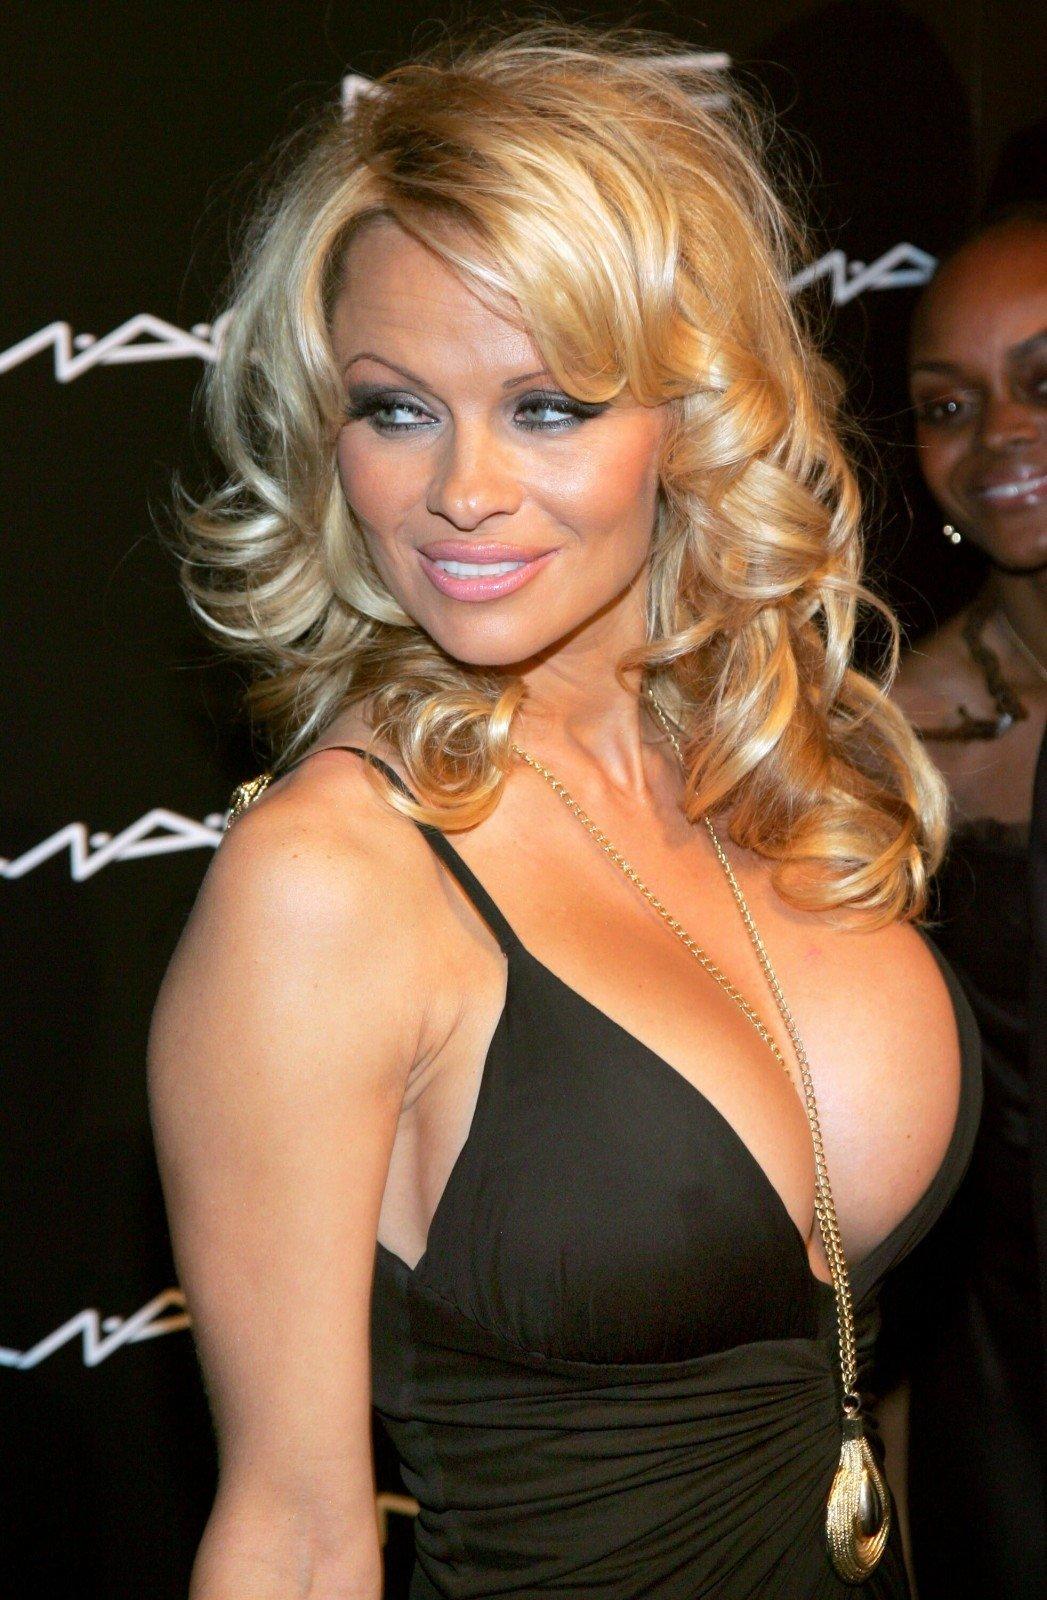 O buvo laikai... Pamel... Pamela Anderson